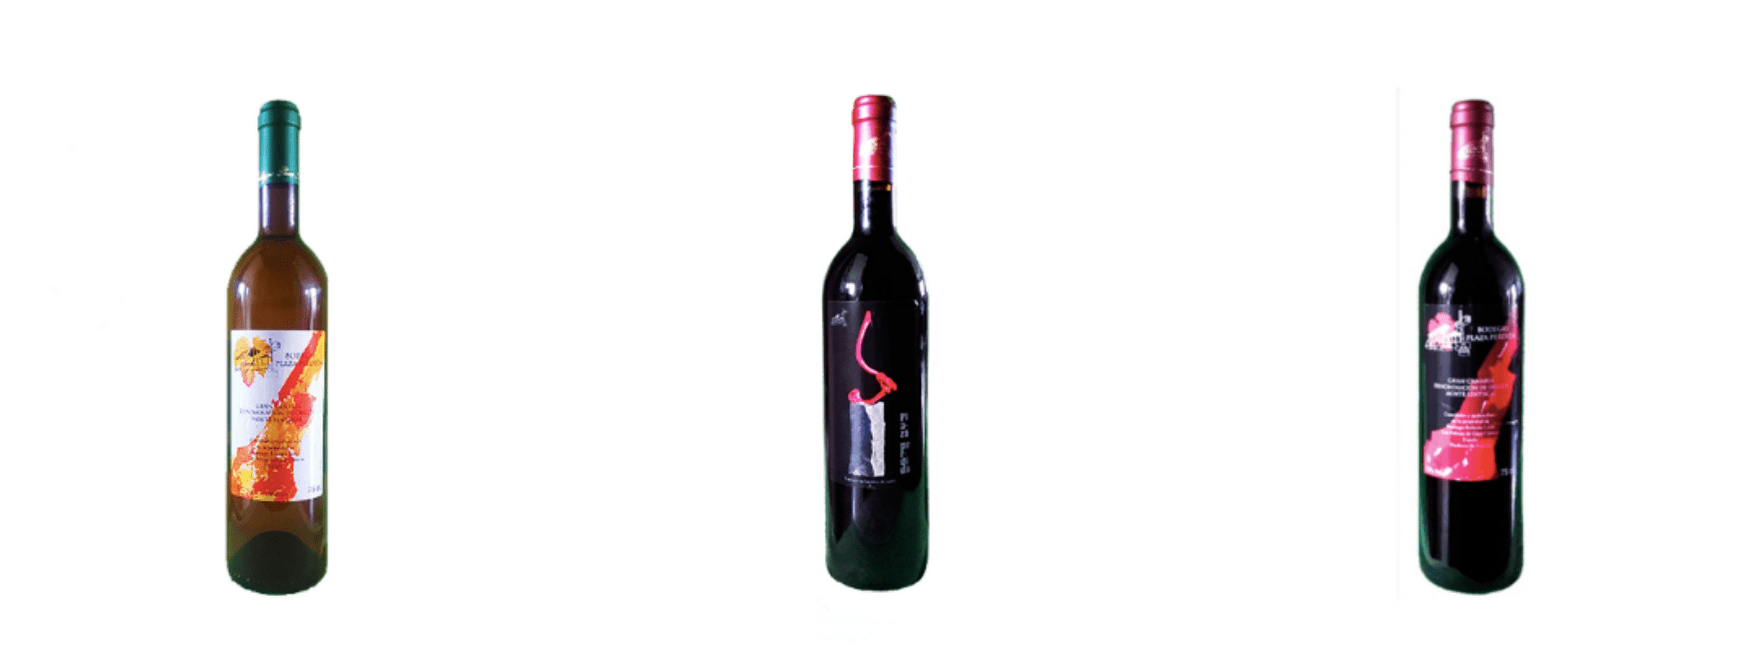 Vinos Plaza Perdida